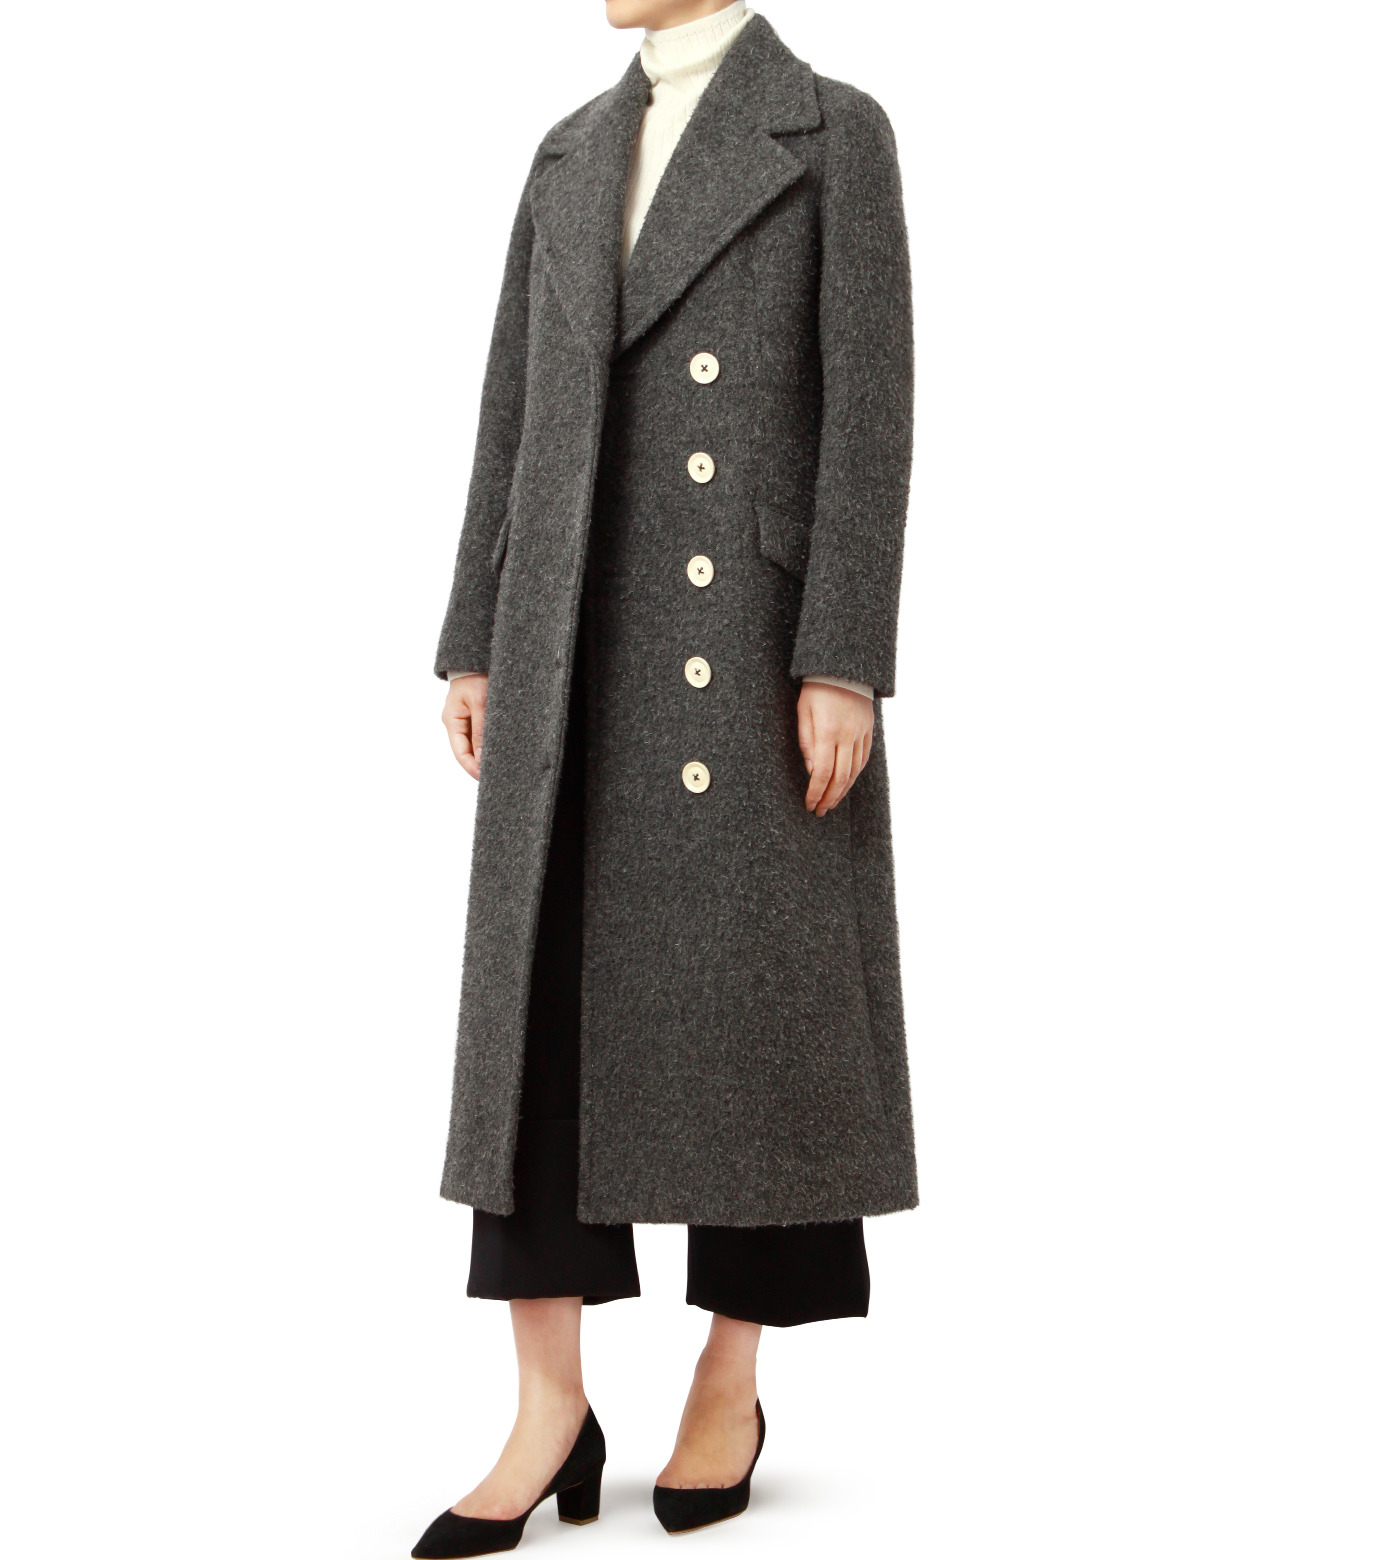 LE CIEL BLEU(ルシェルブルー)のハードナッピングレディシルエットコート-GRAY(コート/coat)-18A69402 拡大詳細画像3